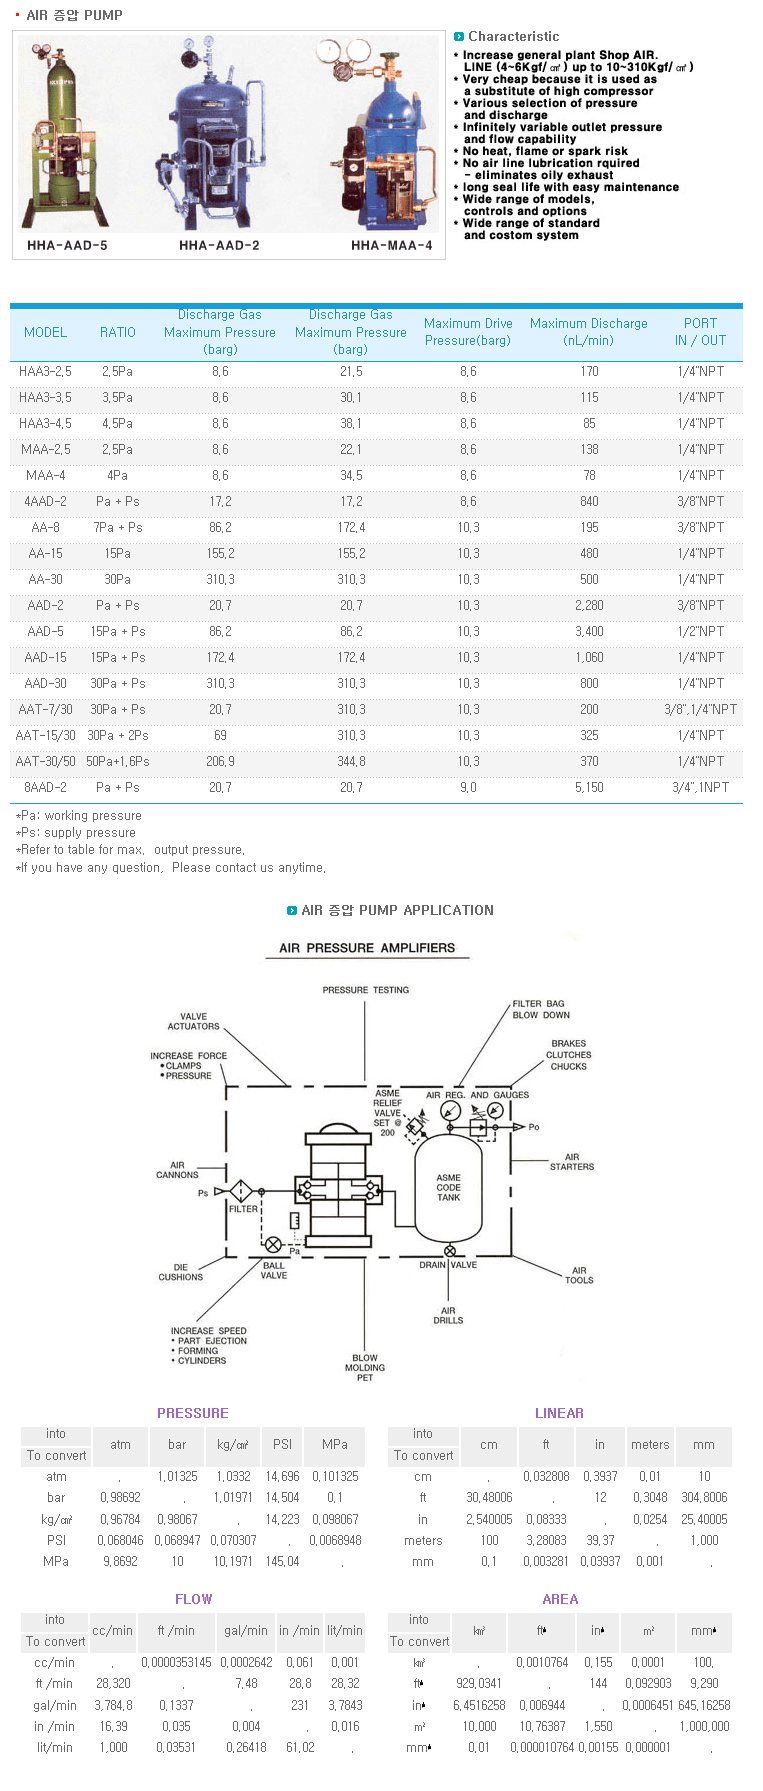 KOREA HYDMAG Air Booster Pump